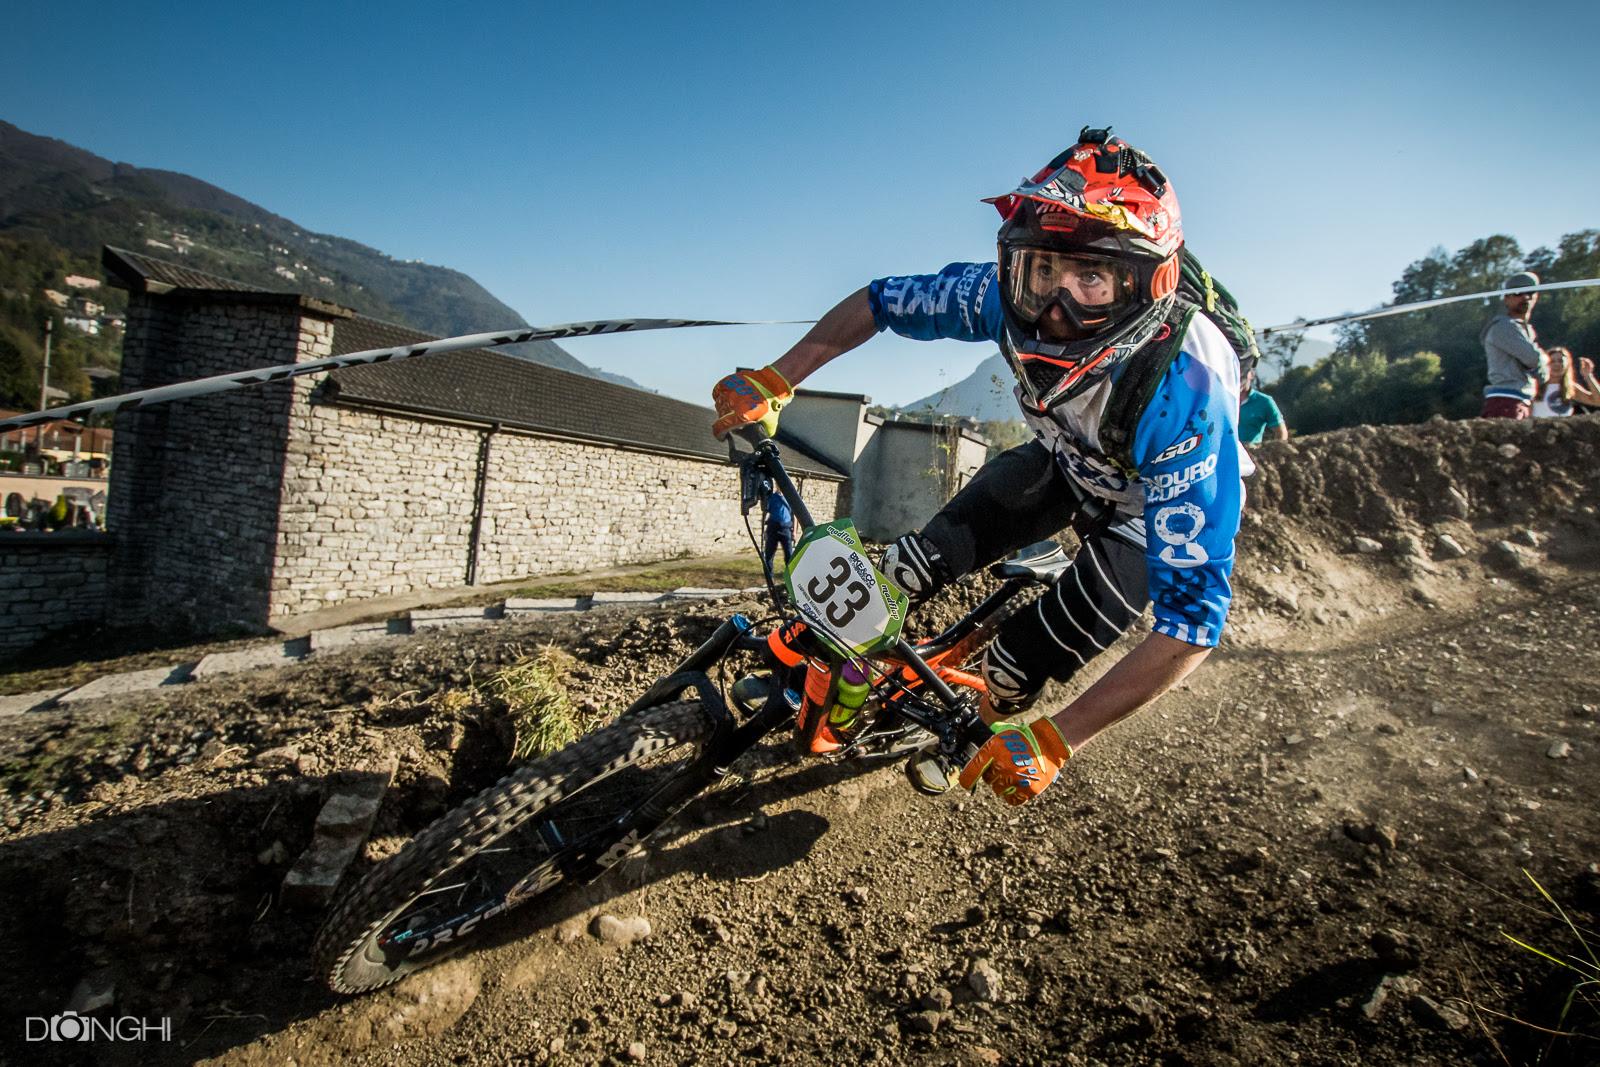 Calendario Mtb.Mtb Mag Com Mountain Bike Online Magazine Enduro Cup